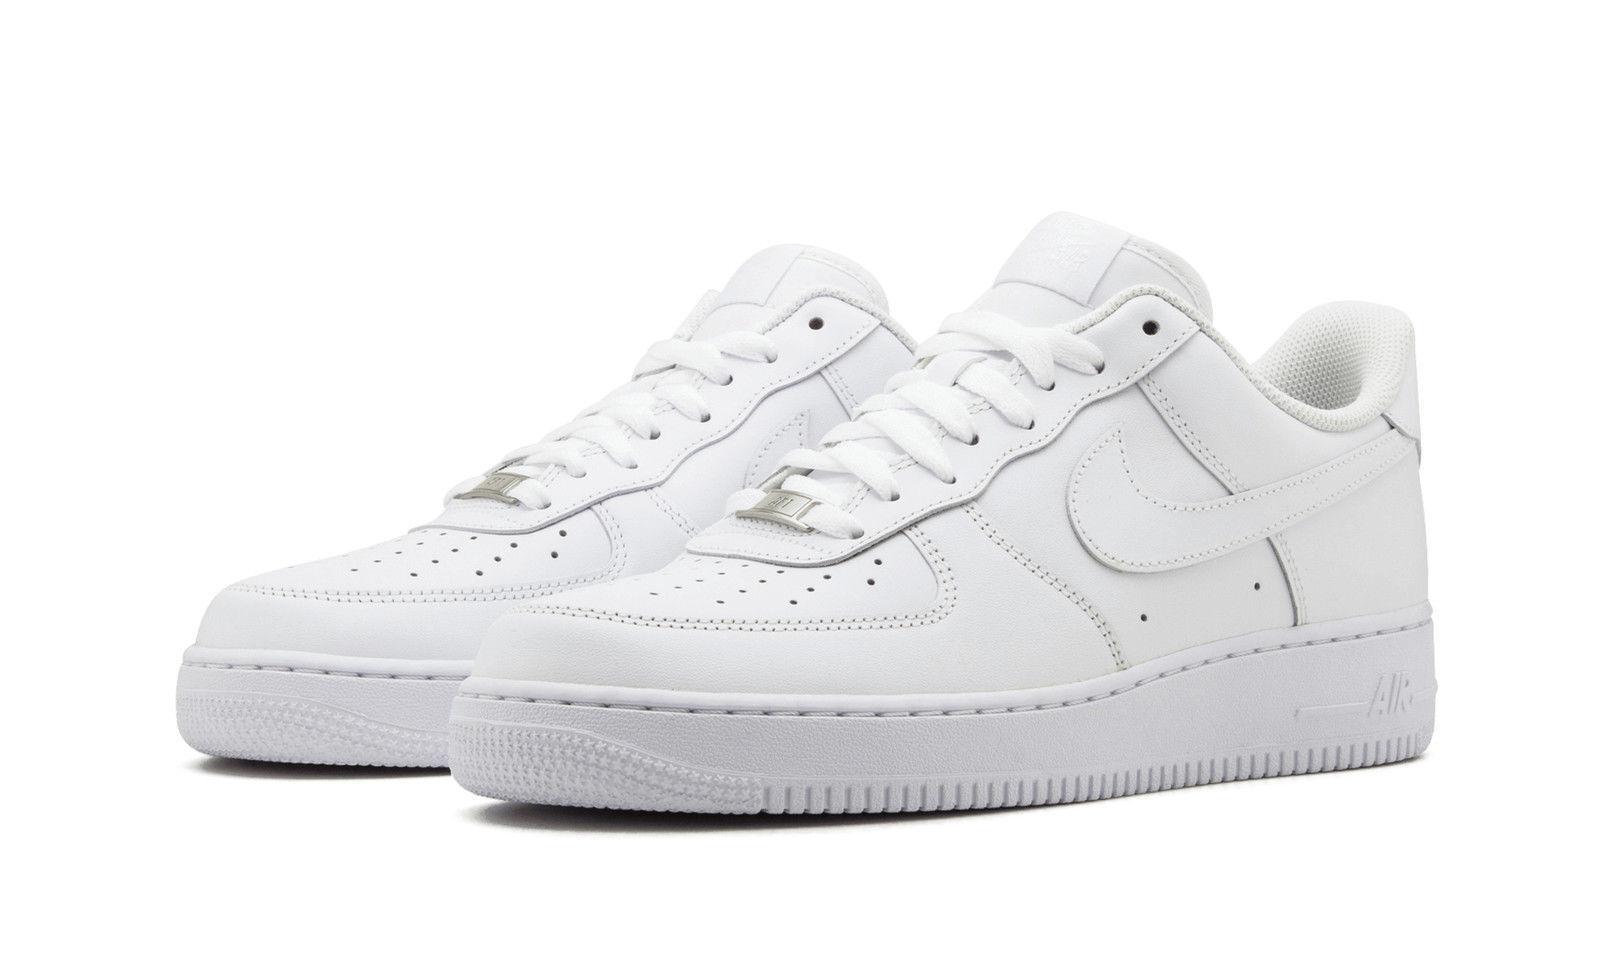 Nike air force 1 basso scarpe da uomo bianco / cuoio bianco 315122-111